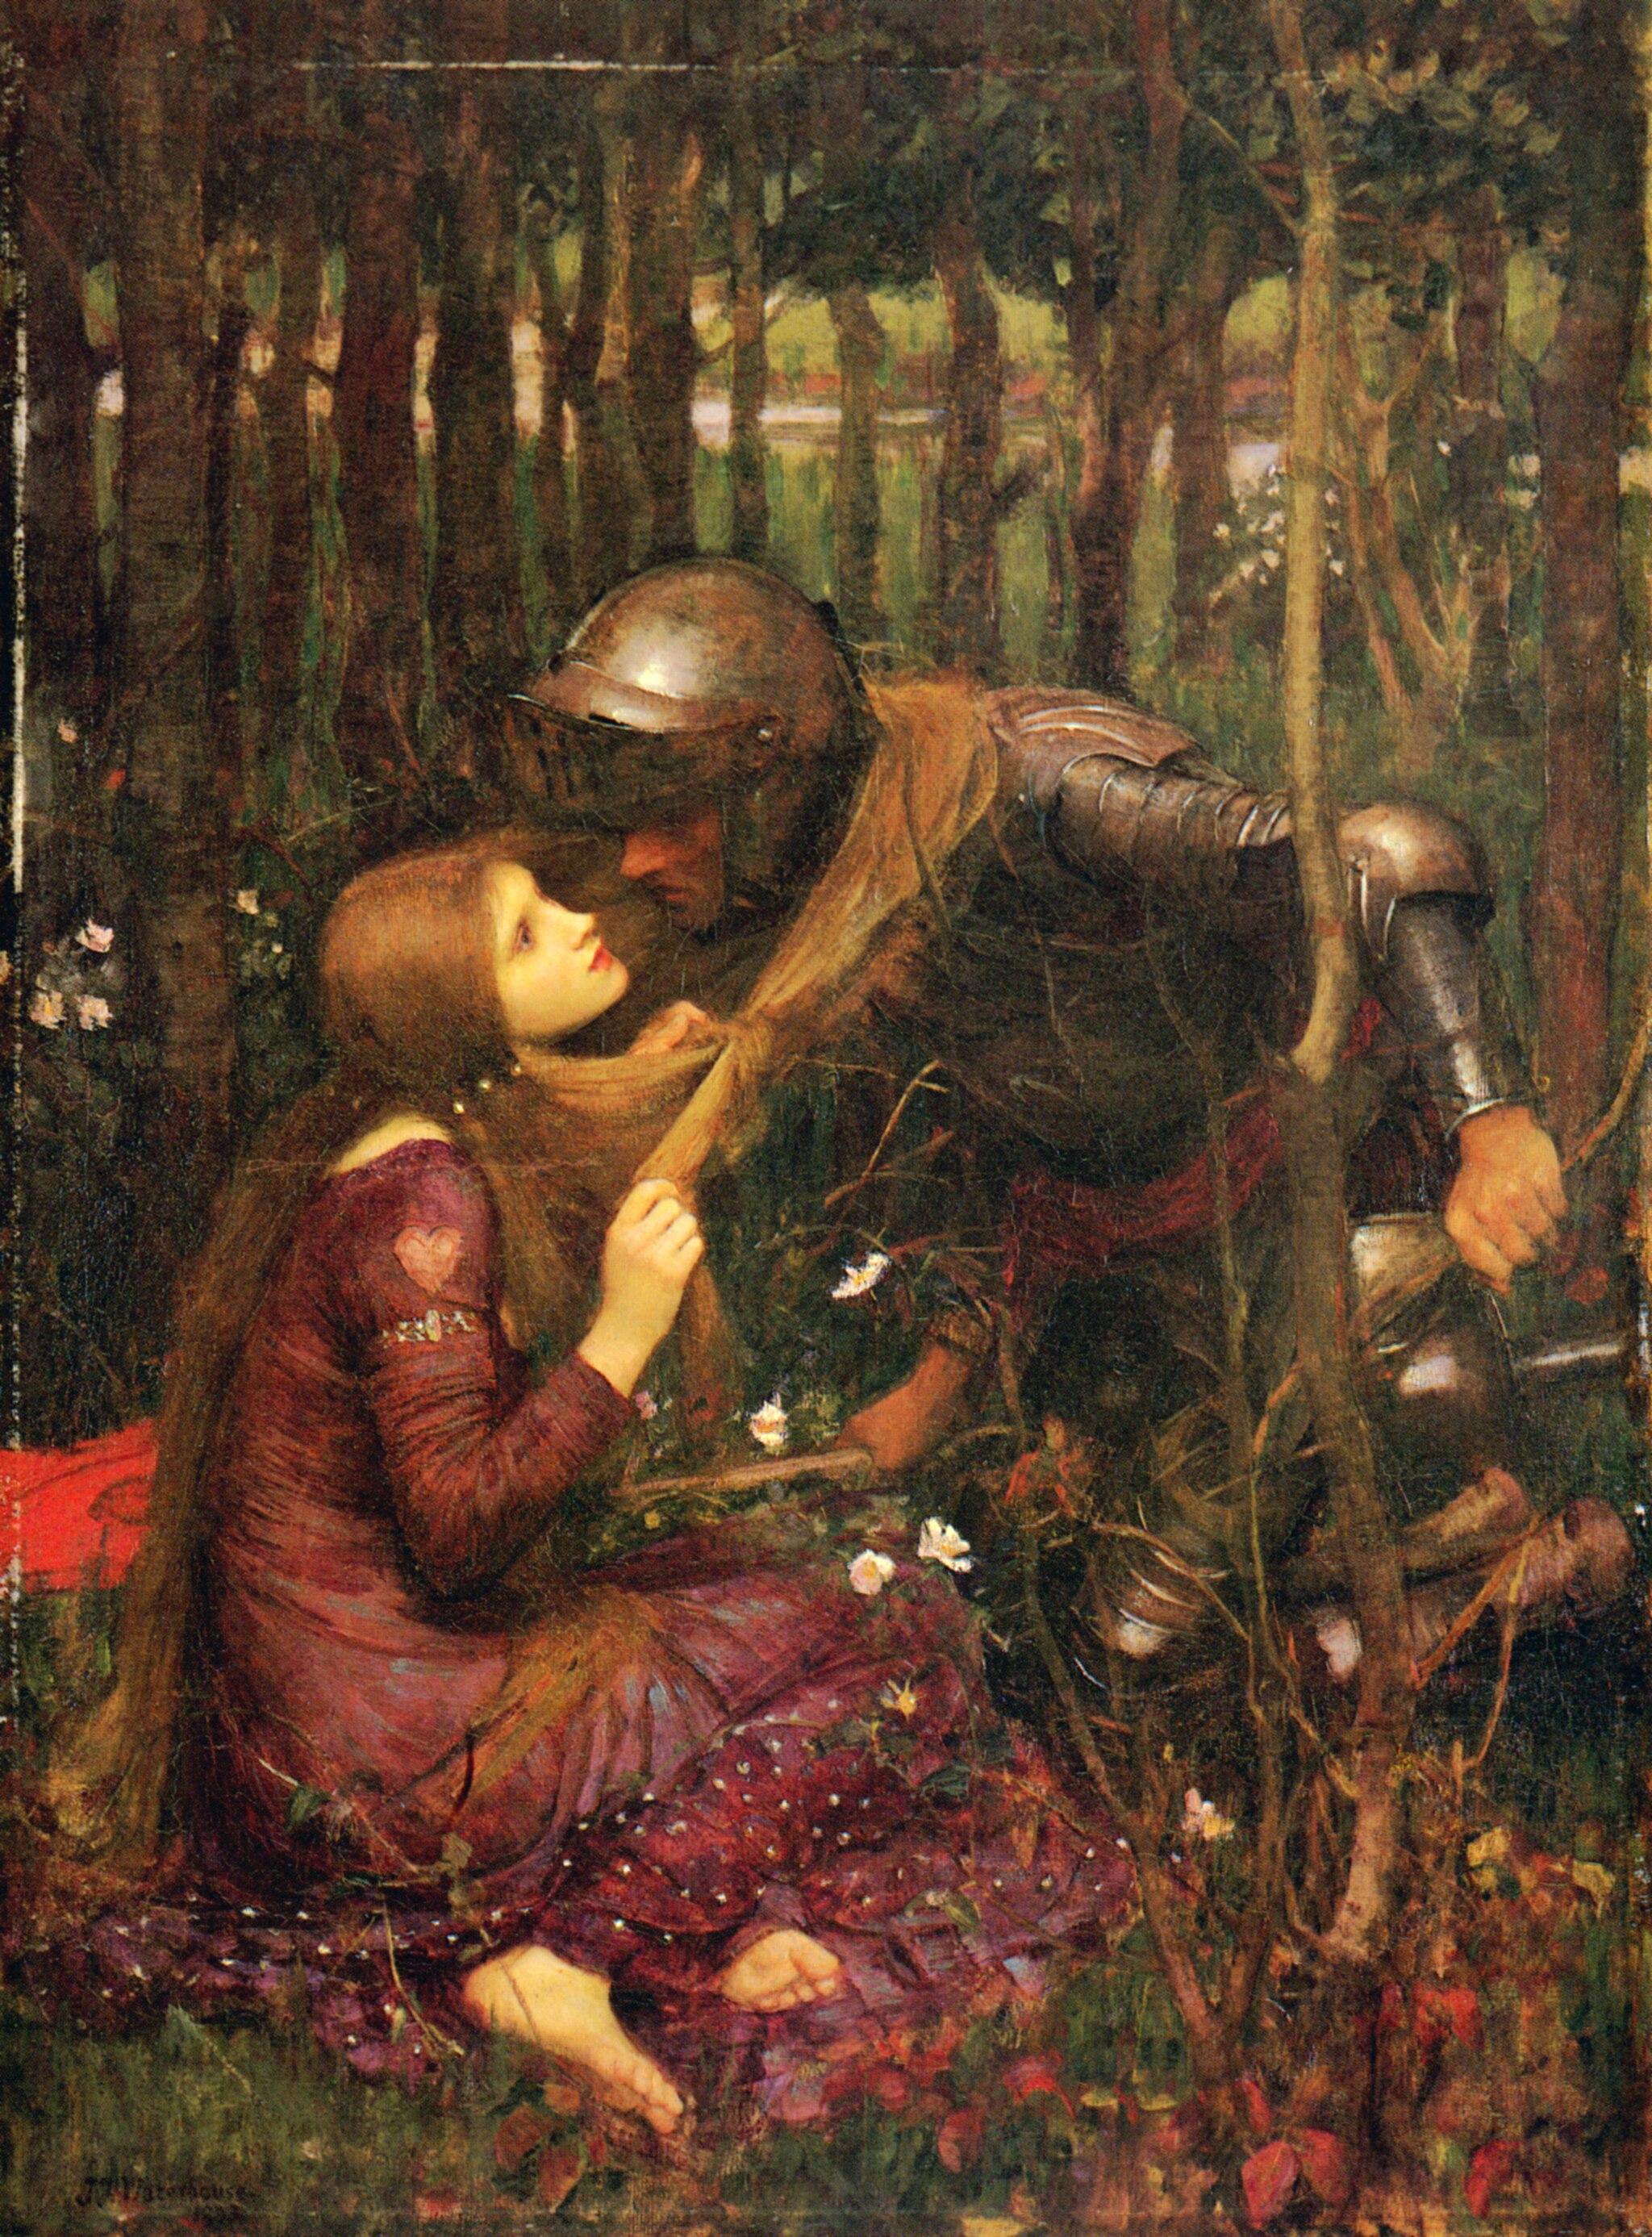 John William Waterhouse - La Belle Dame sans Merci (1893)